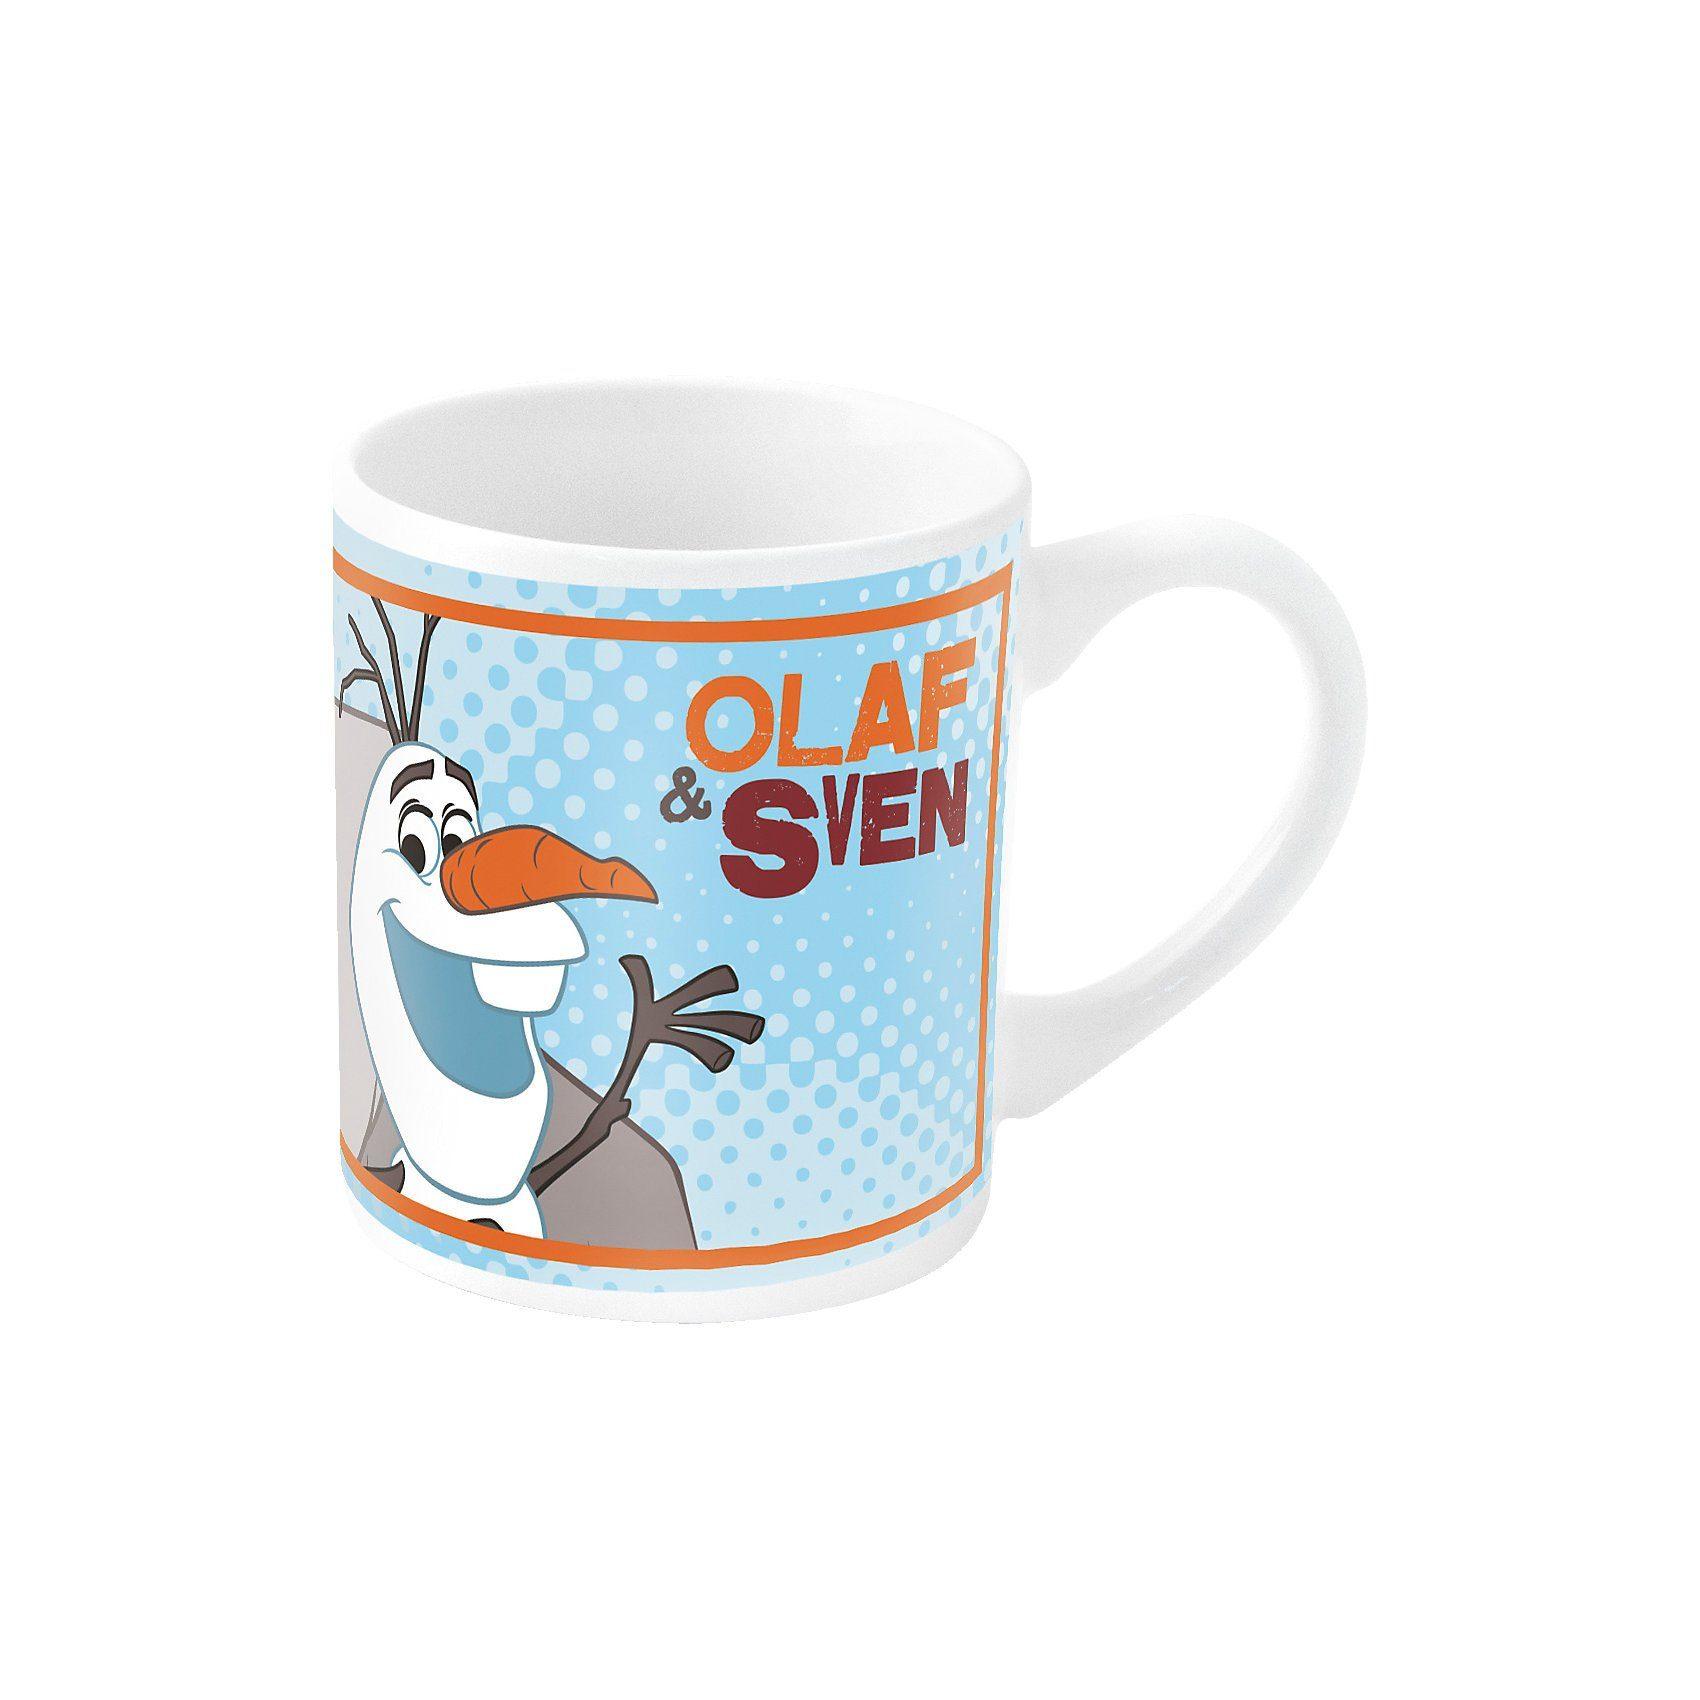 P:OS Tasse Keramik Die Eiskönigin Olaf, 200 ml